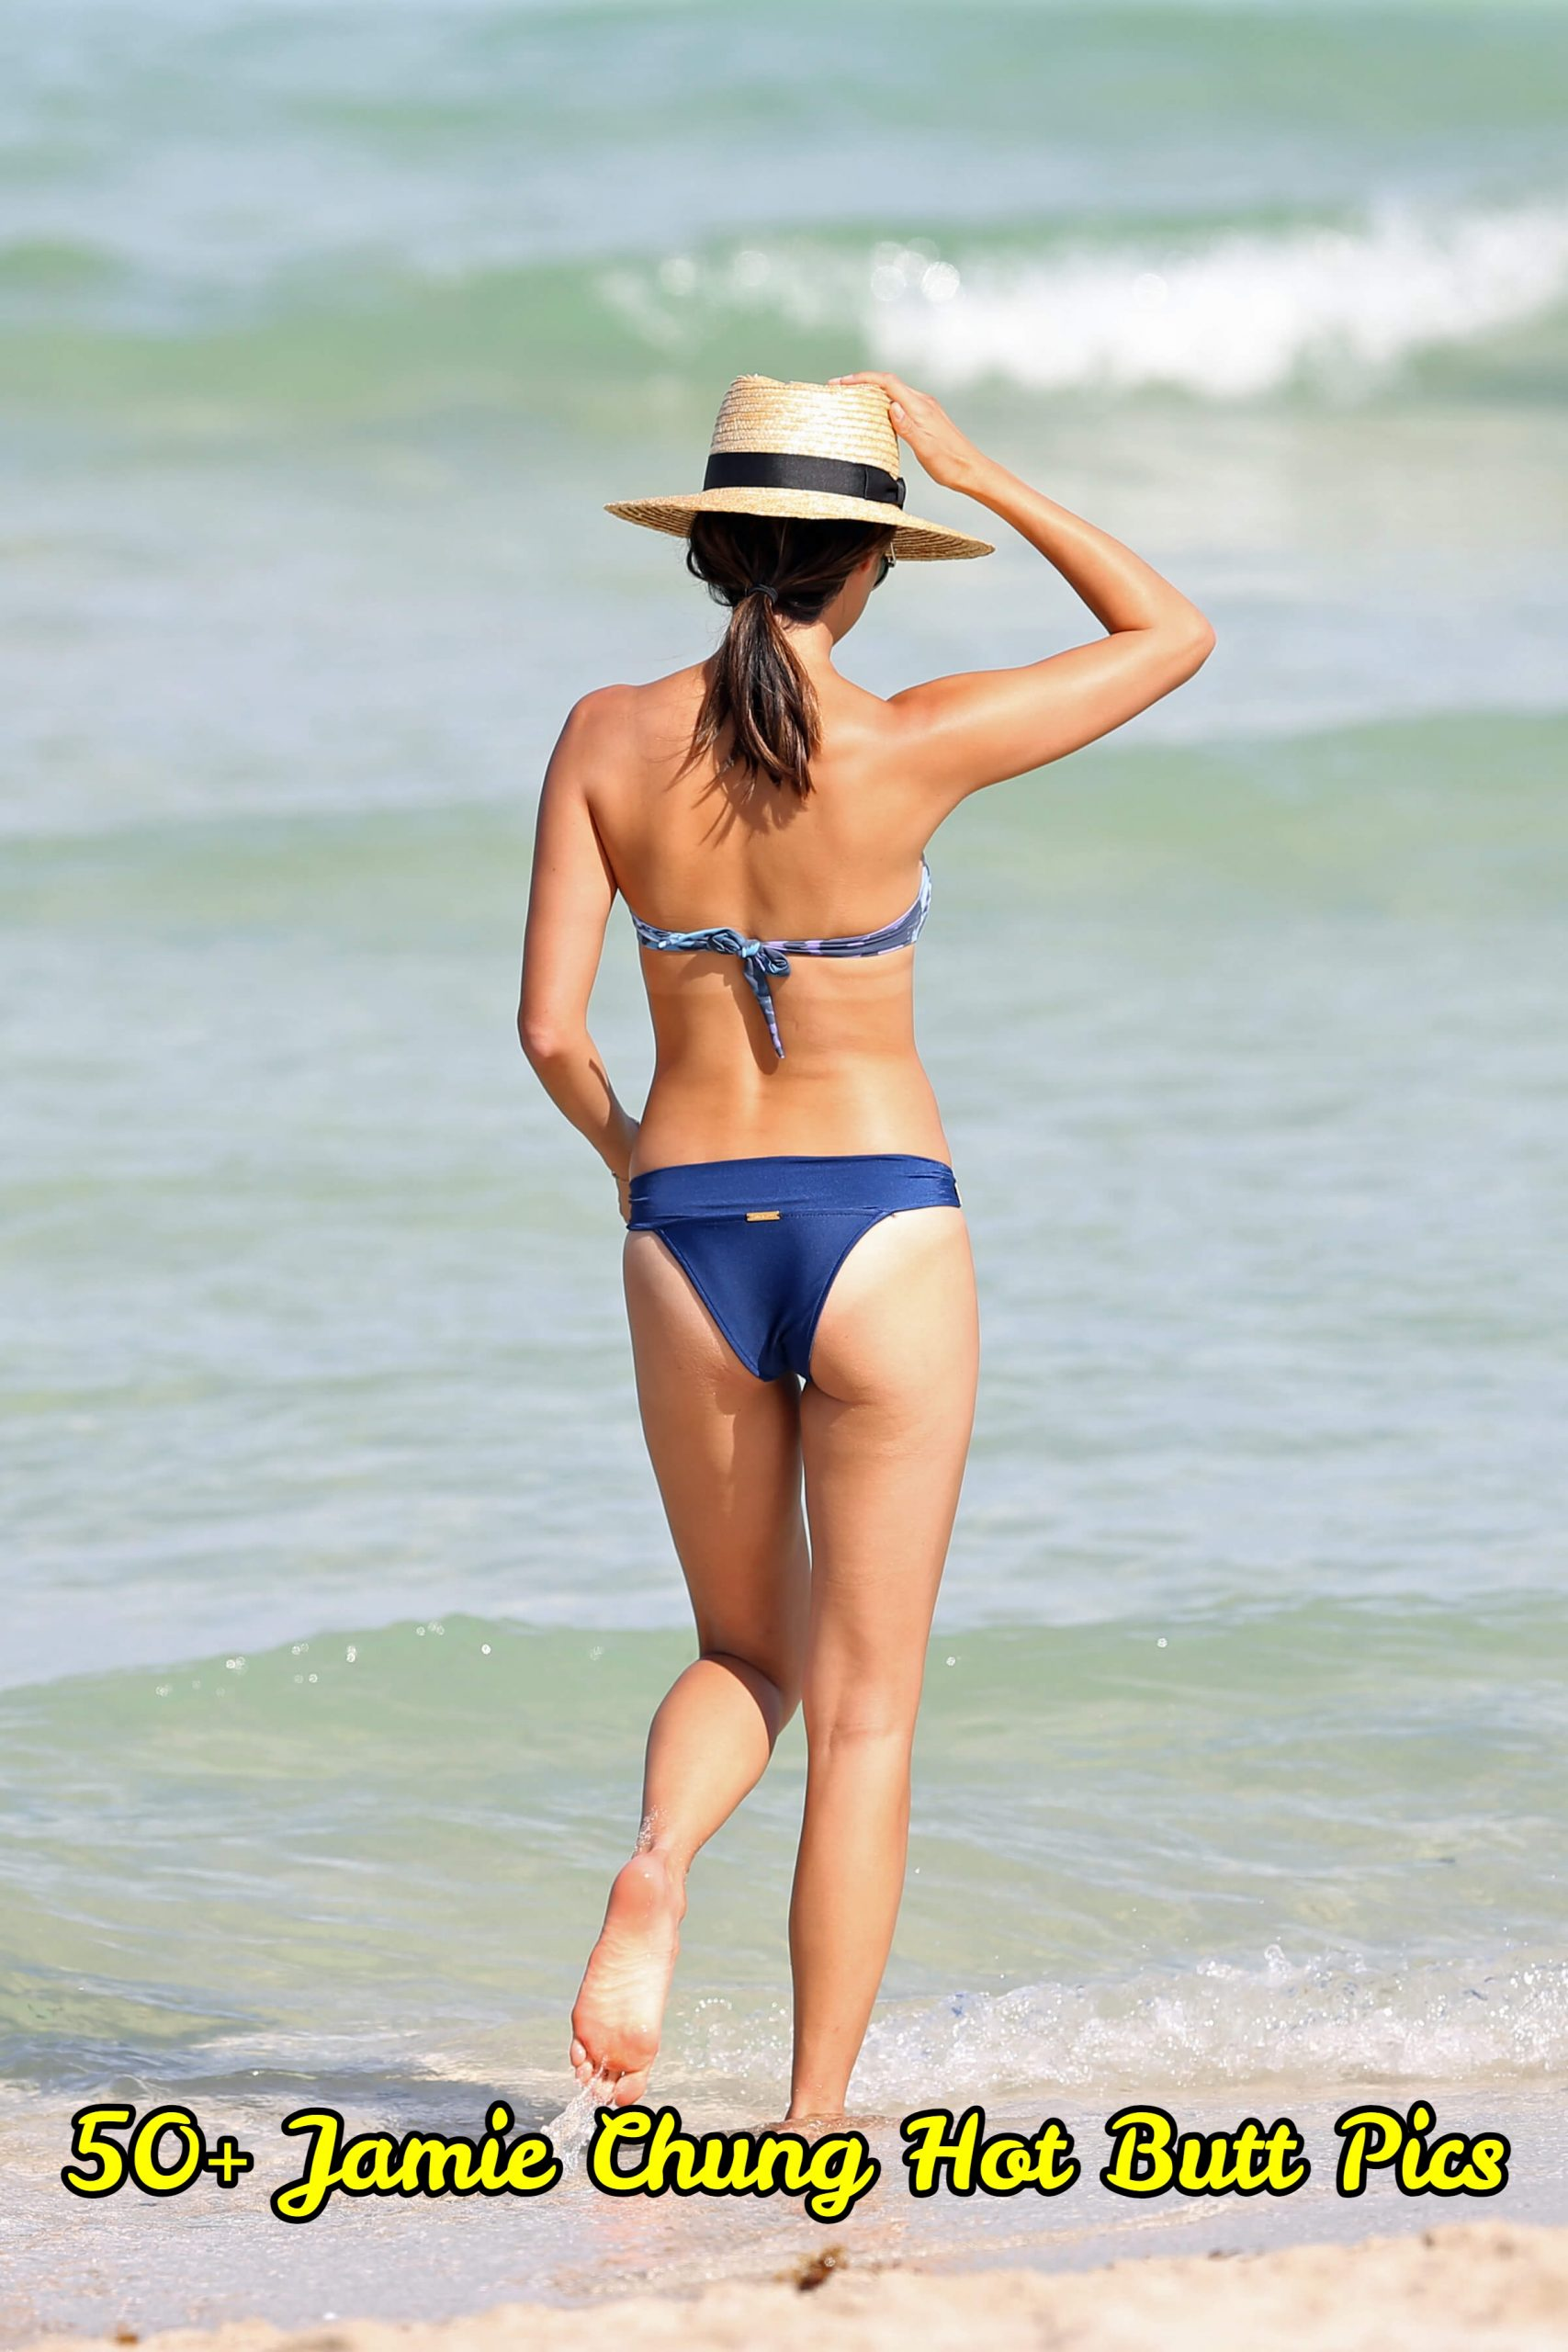 Jamie Chung Hot Butt Pics